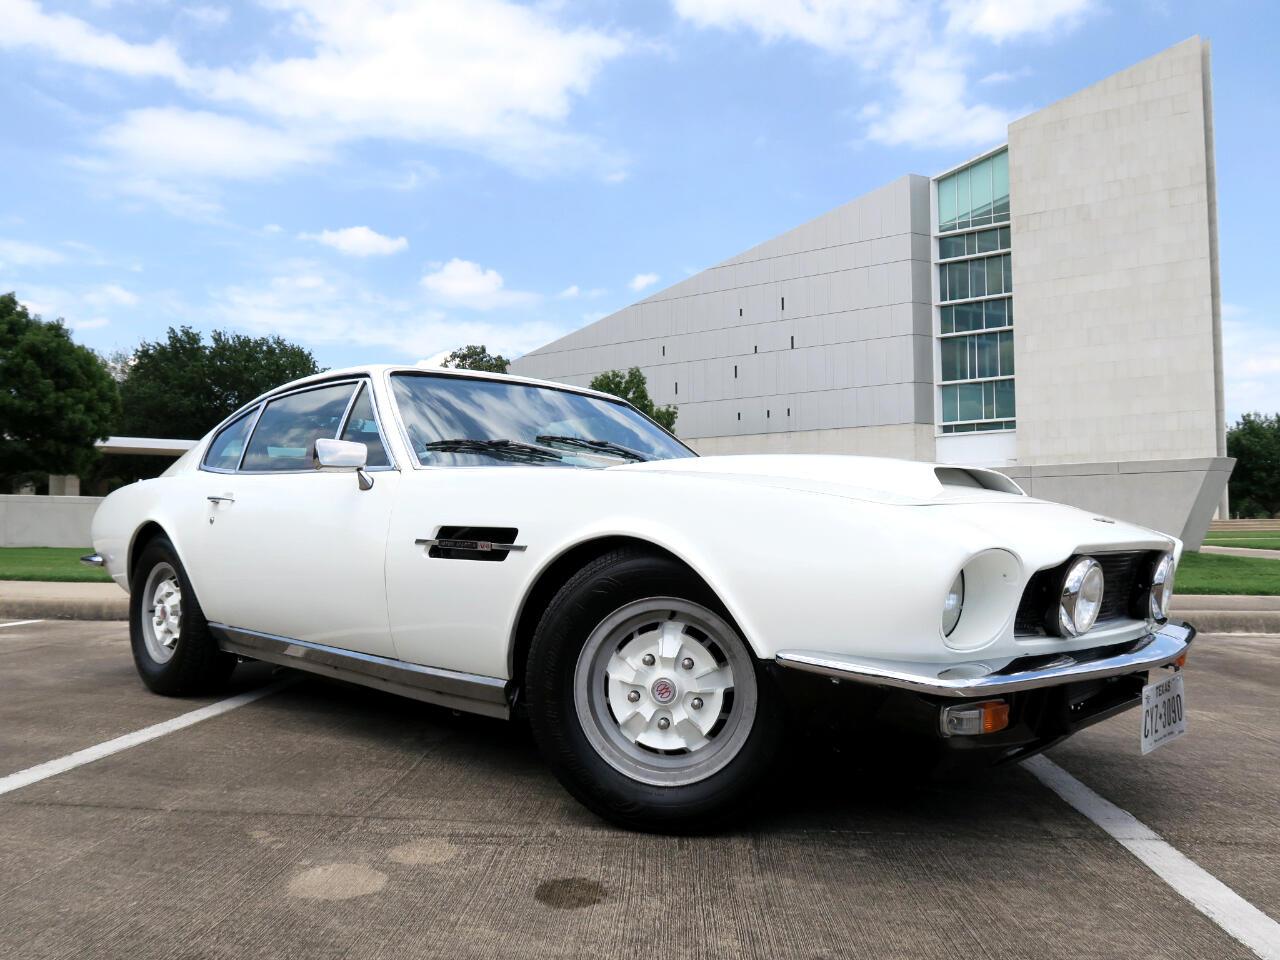 1974 Aston Martin V8 Series III